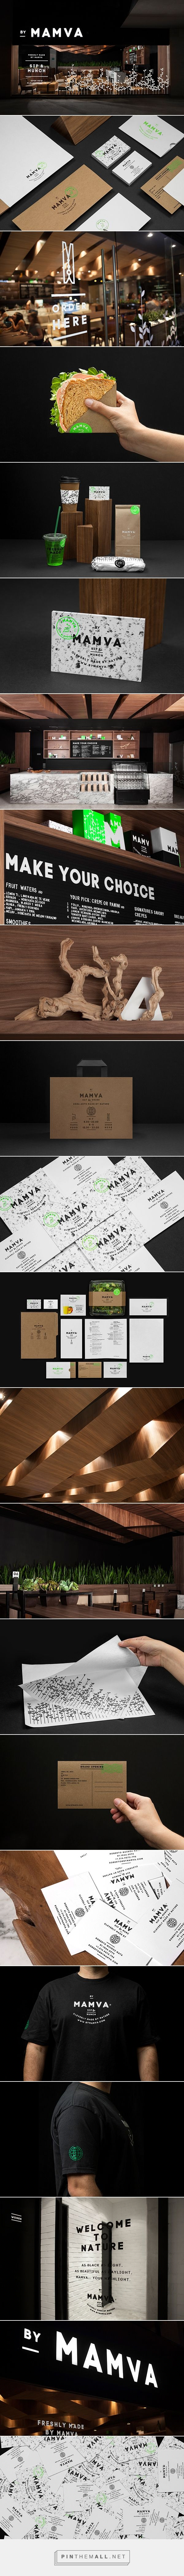 Mamva on Behance - created via http://pinthemall.net